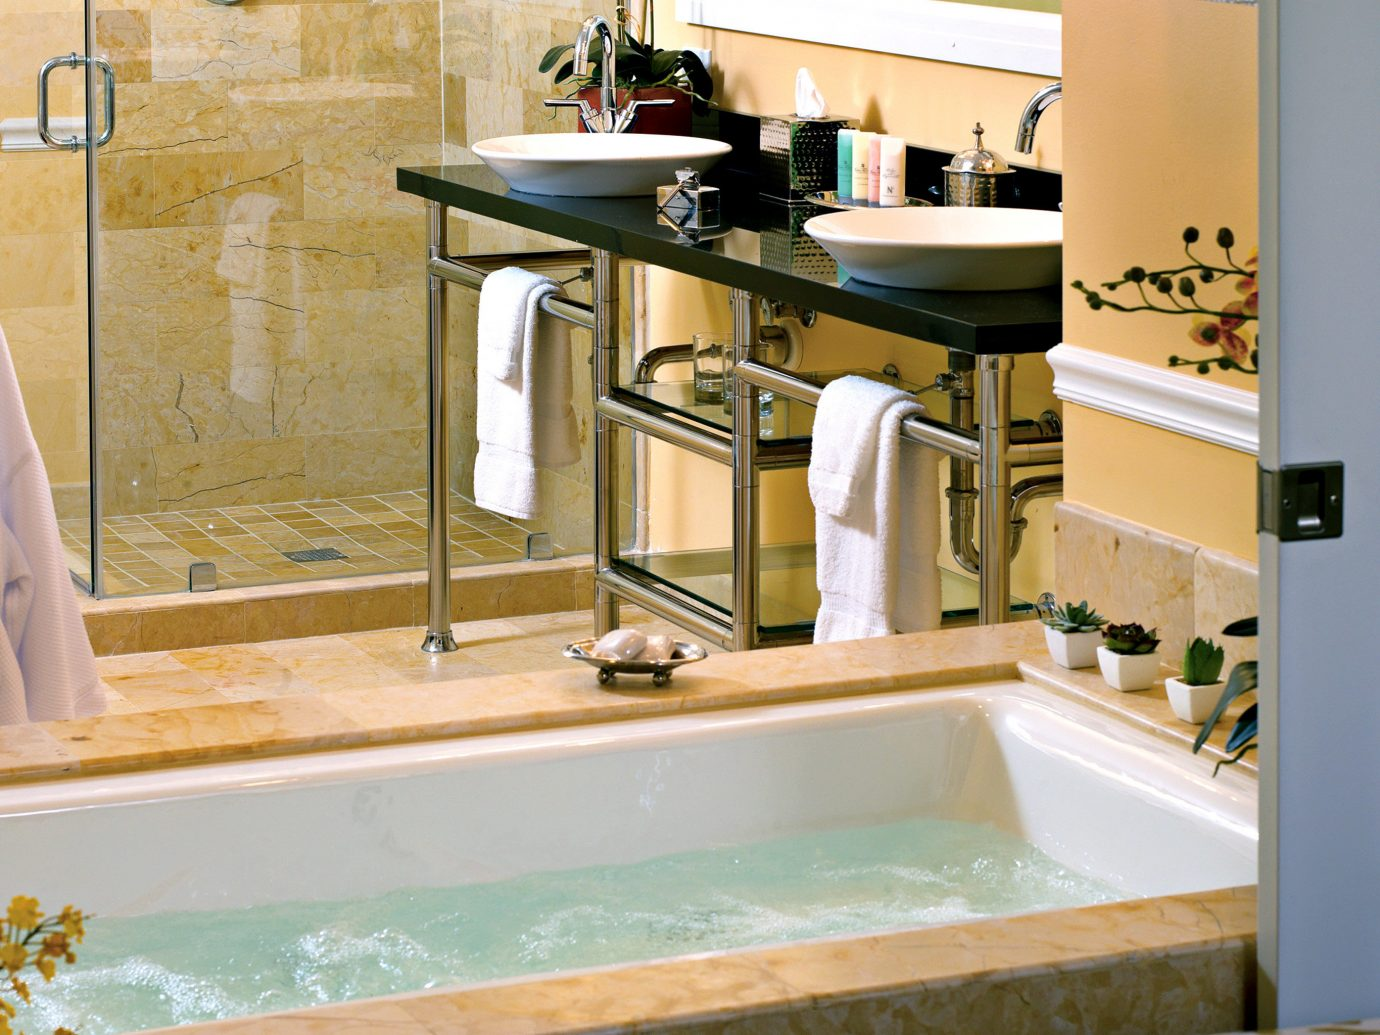 Bath Elegant Florida Hotels Resort indoor bathroom room sink property countertop swimming pool Kitchen plumbing fixture floor bathtub home toilet interior design estate flooring vessel counter tub water basin